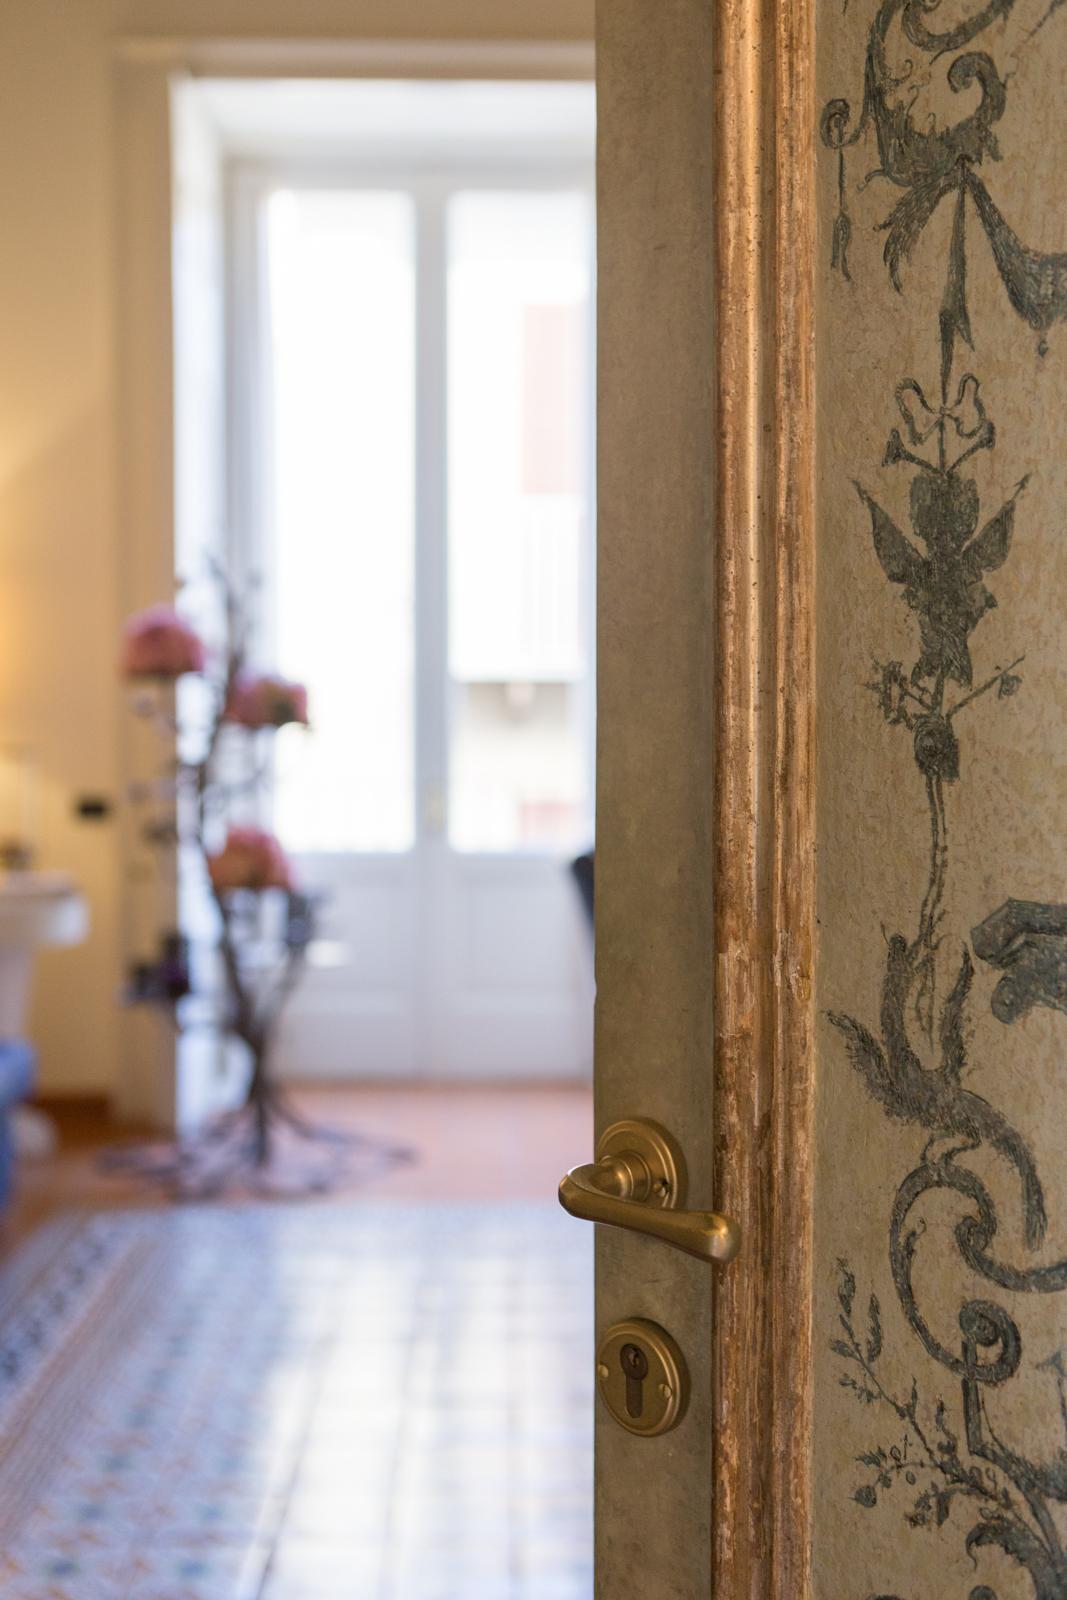 Doors at Maison Tofani retain the artwork of the 18th century